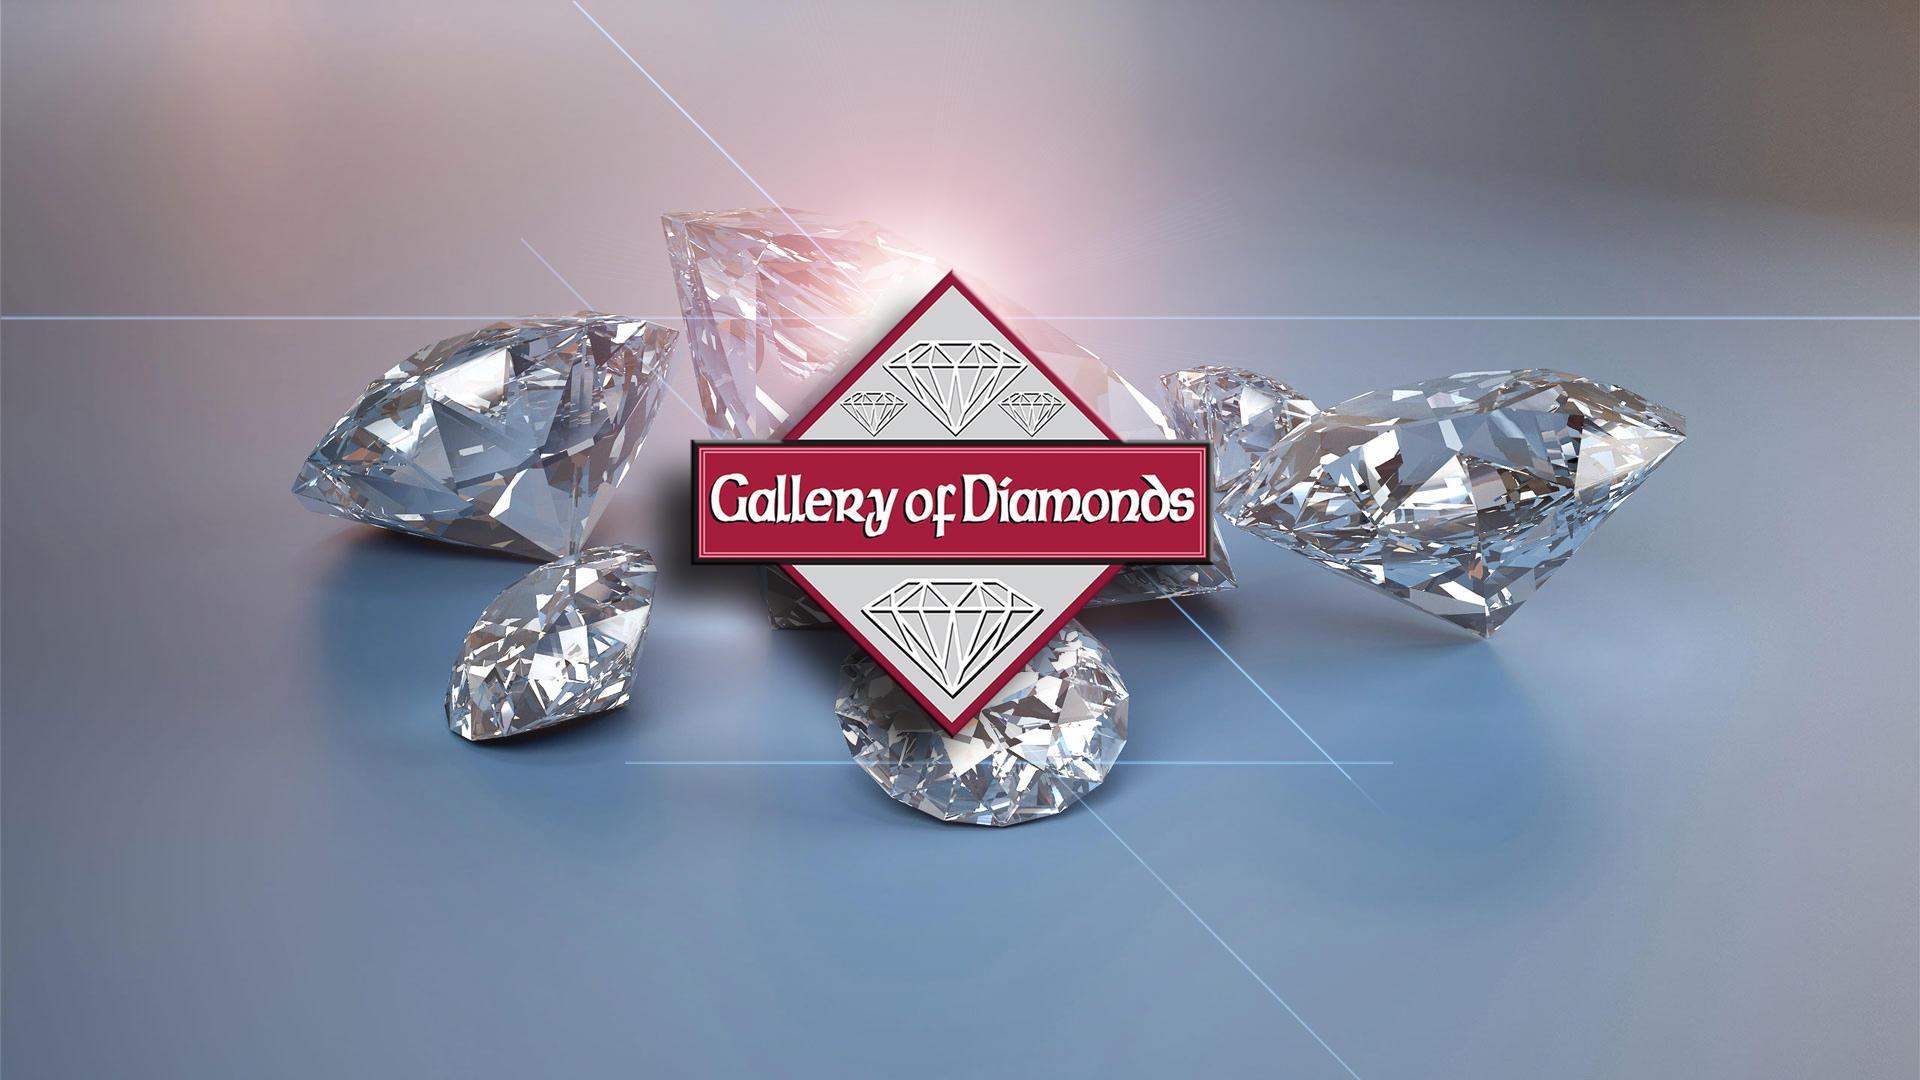 Gallery Of Diamonds image 2